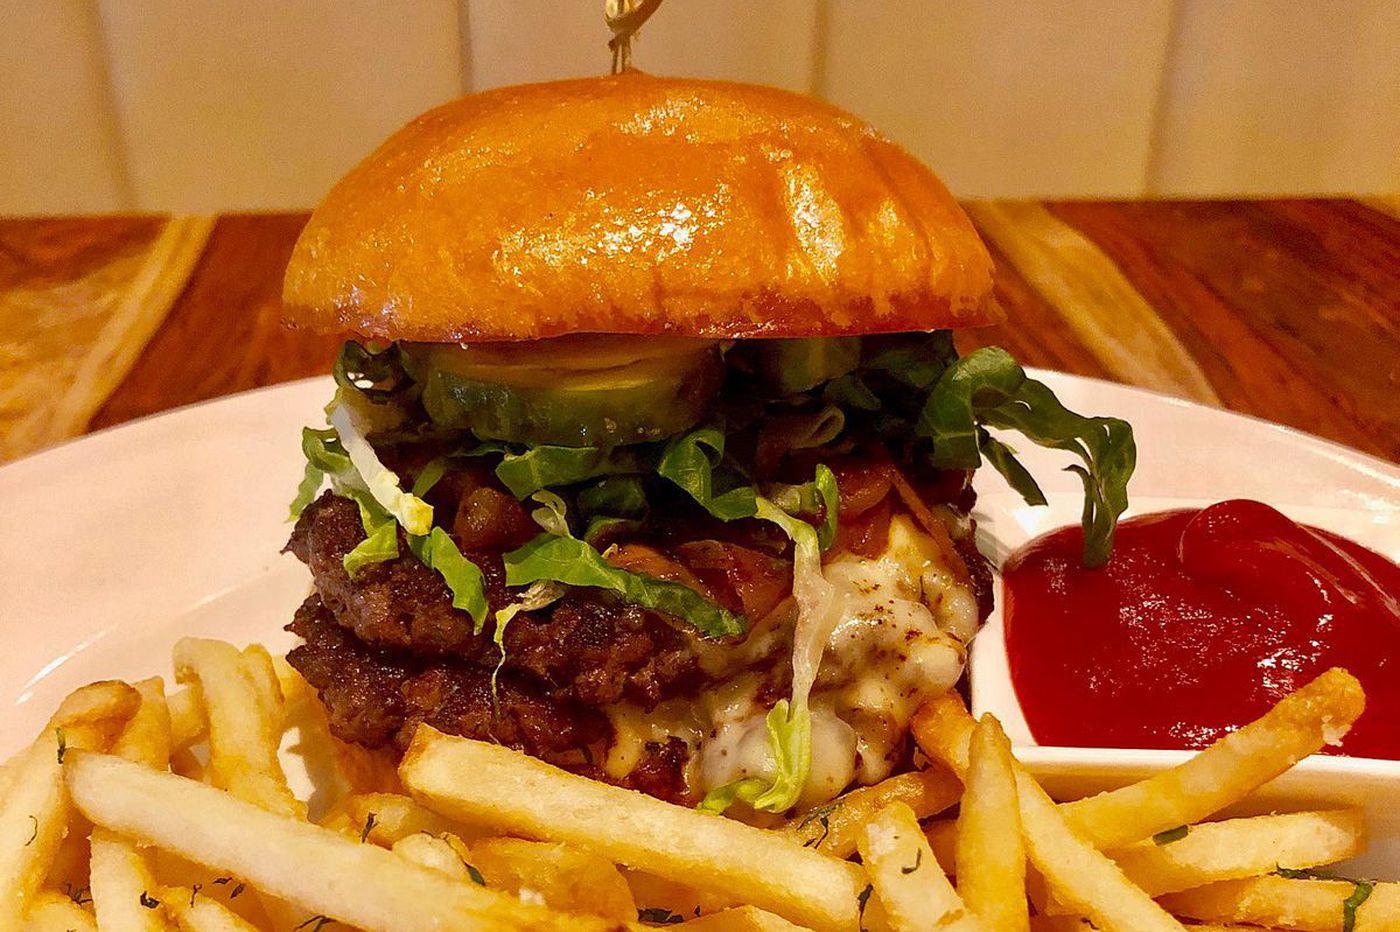 Our favorite burgers | Let's Eat